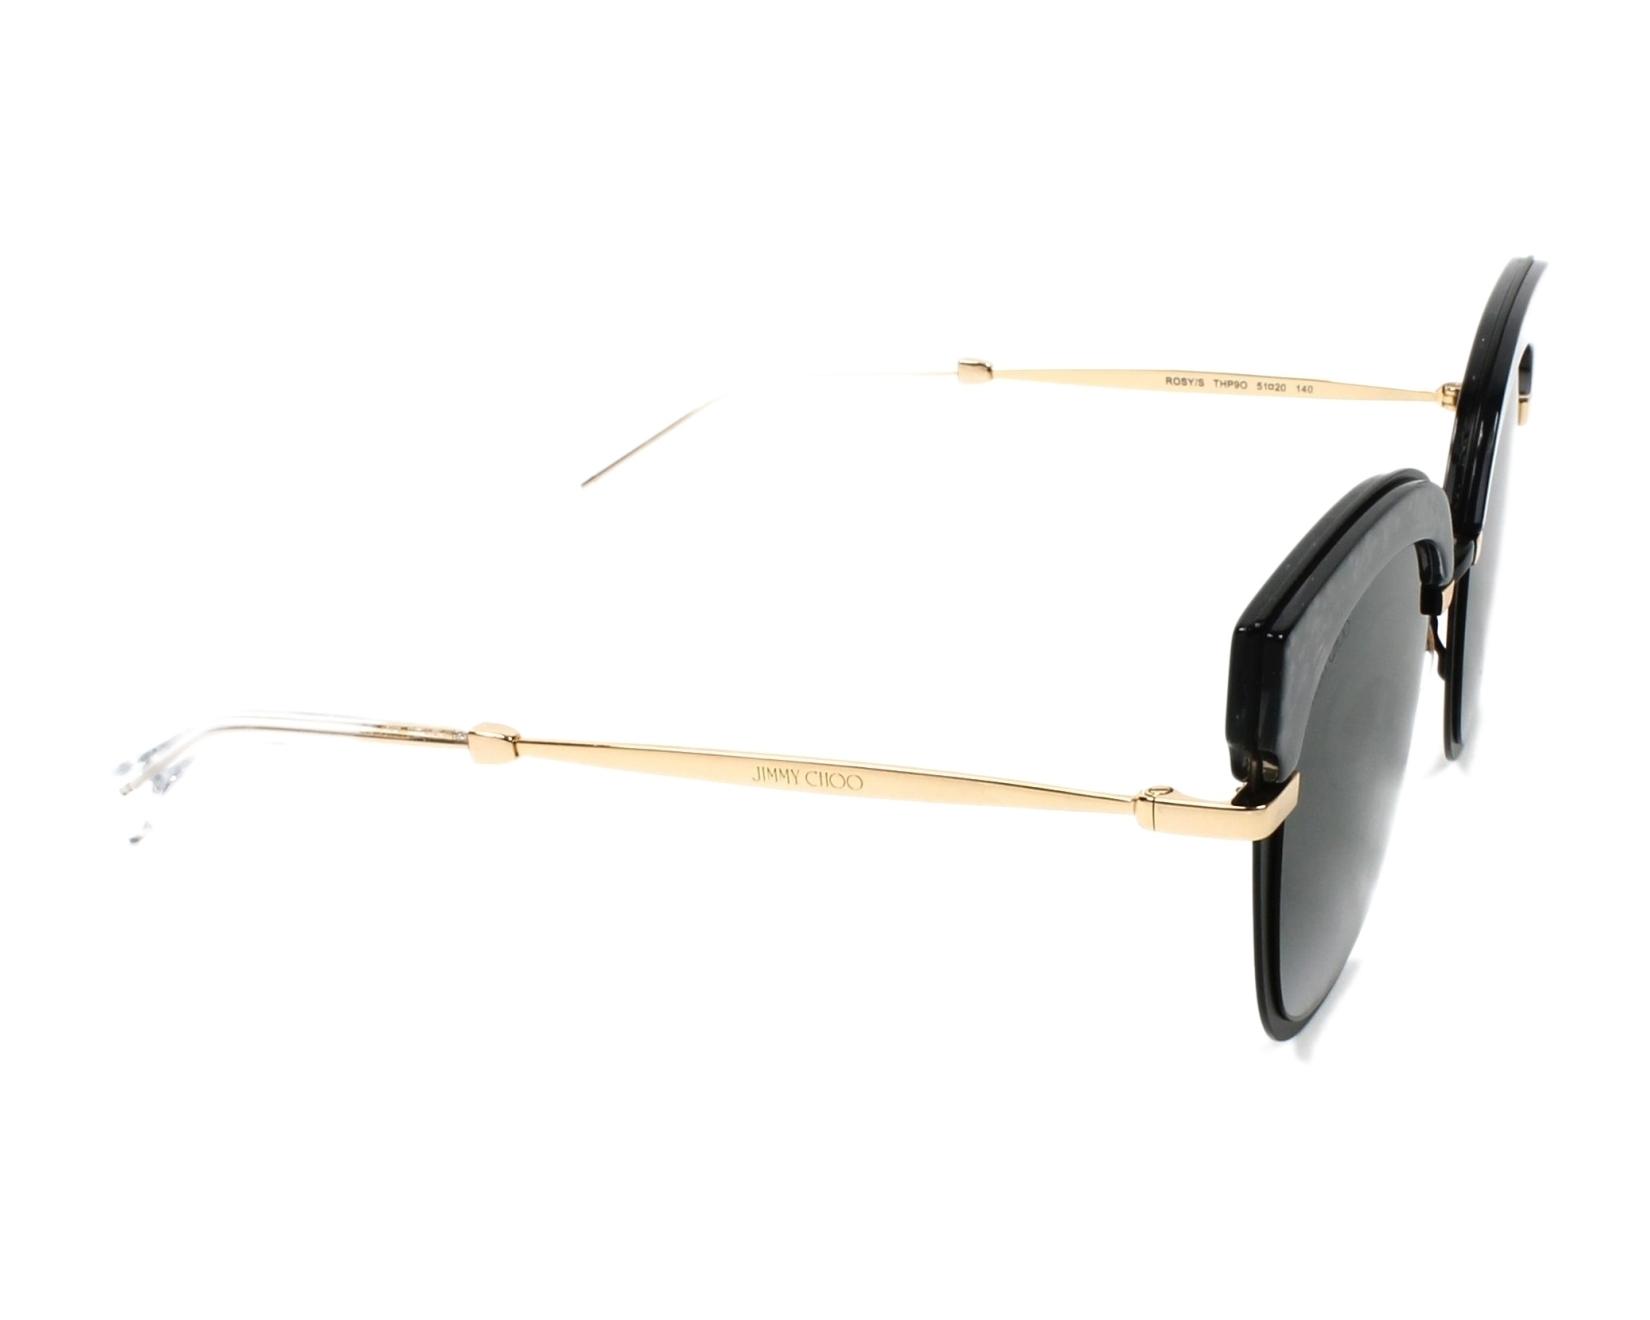 ce5378d6e0e75 Sunglasses Jimmy Choo ROSY-S THP 90 51-20 Black Gold side view